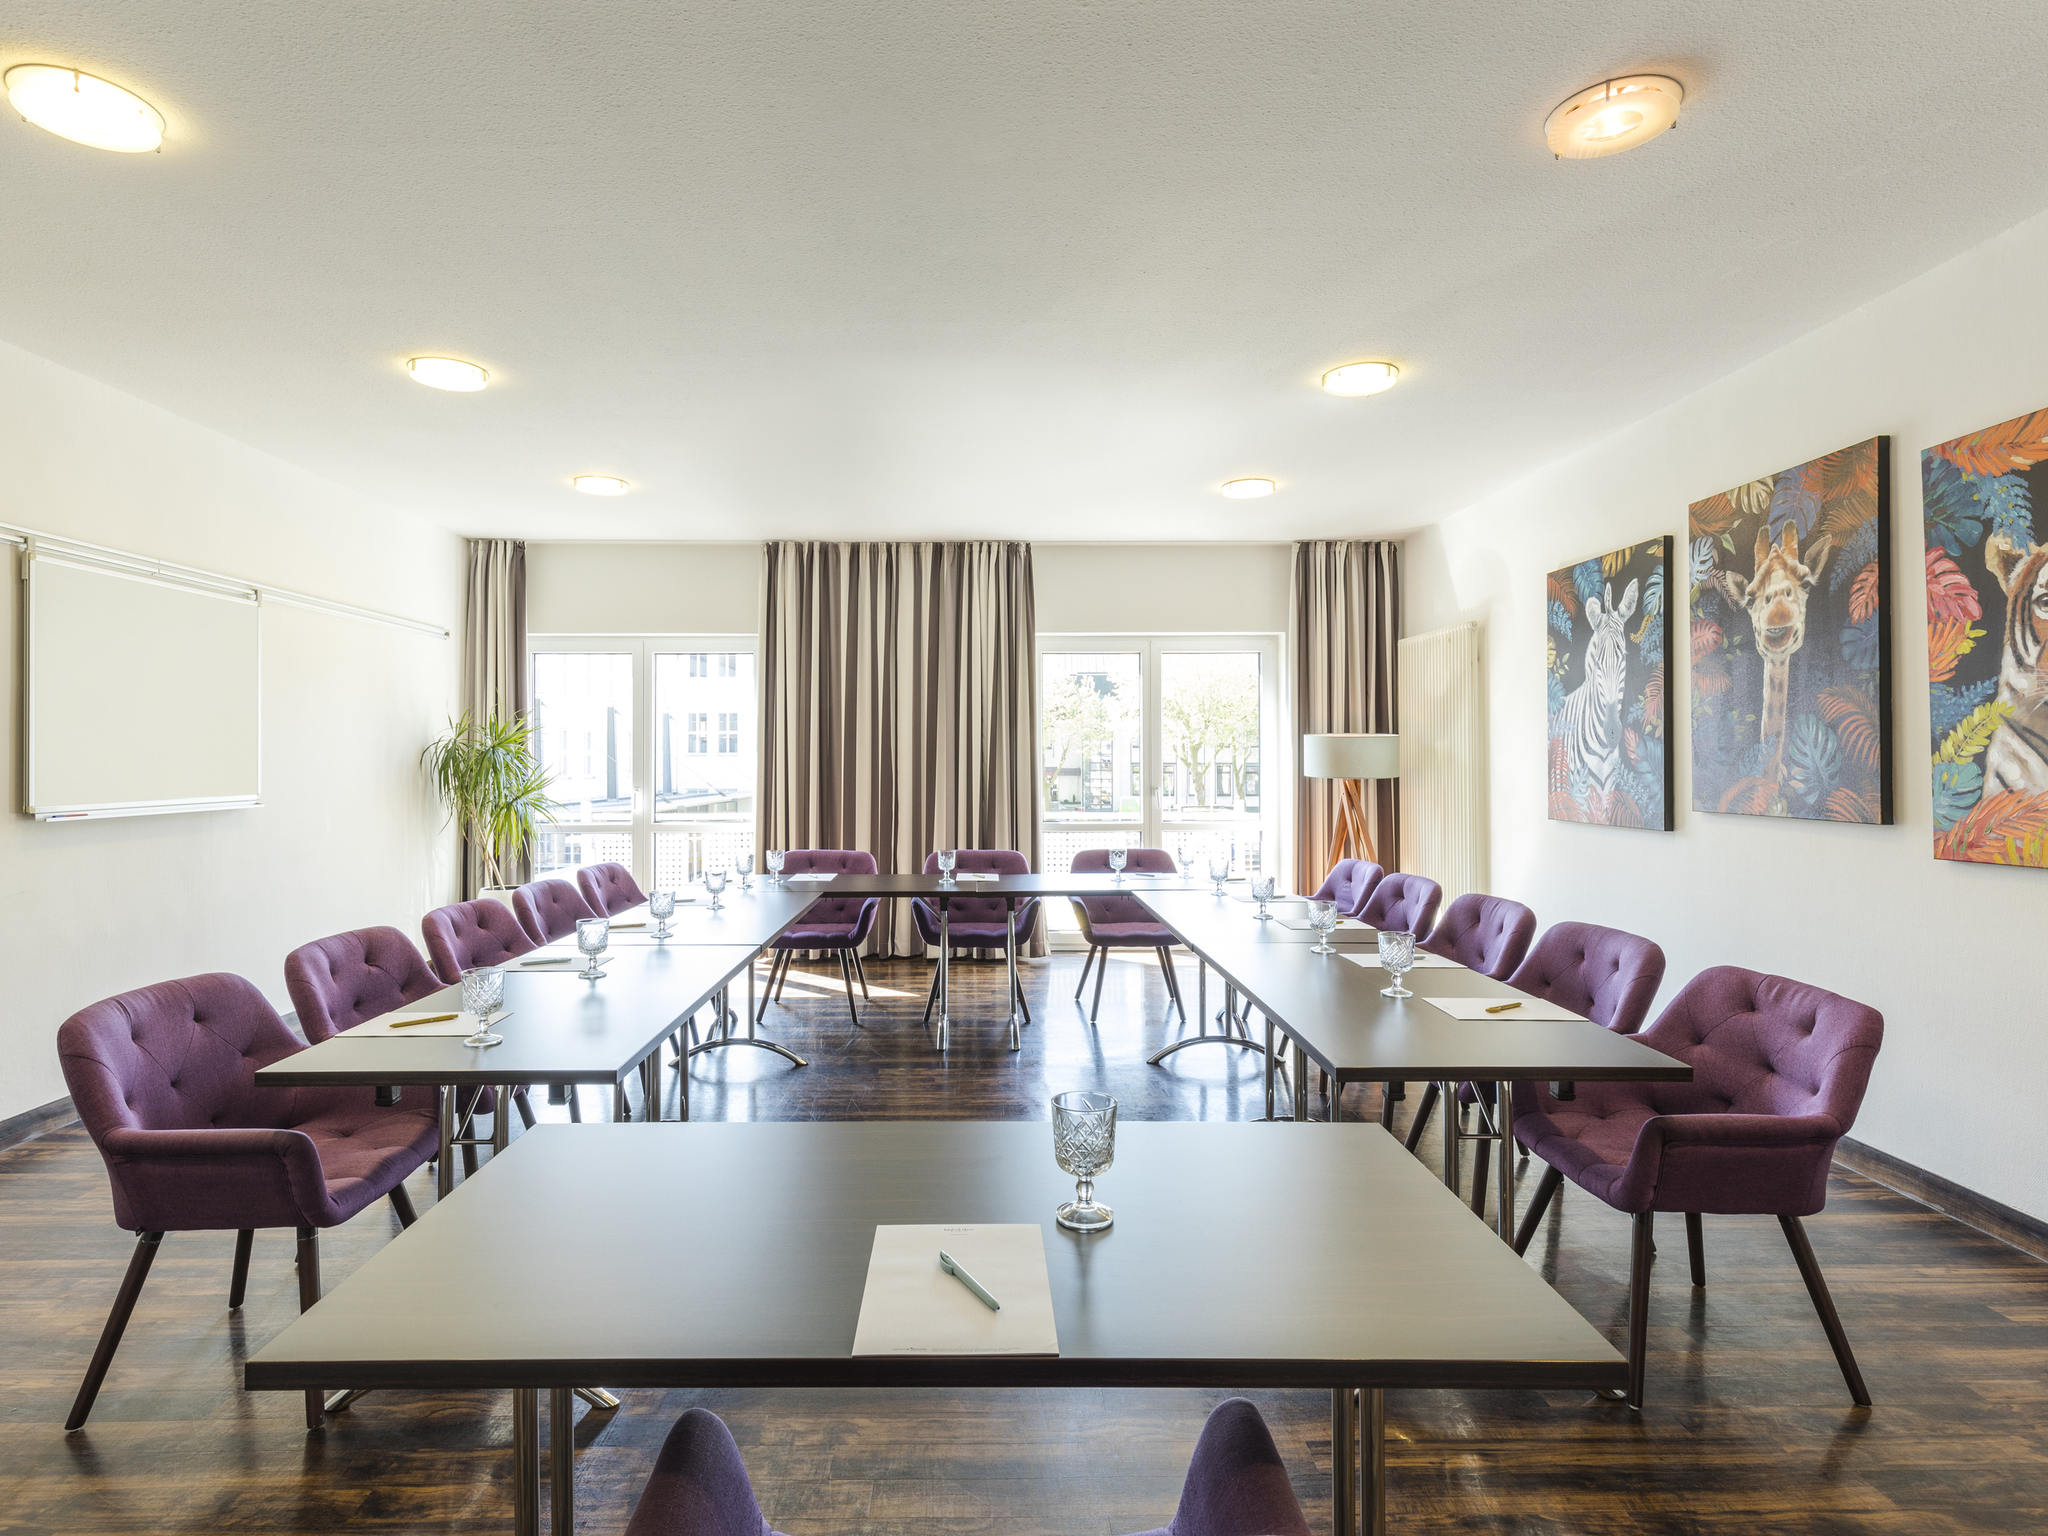 3 Star Hotel Bad Oeynhausen City Mercure Accorhotels